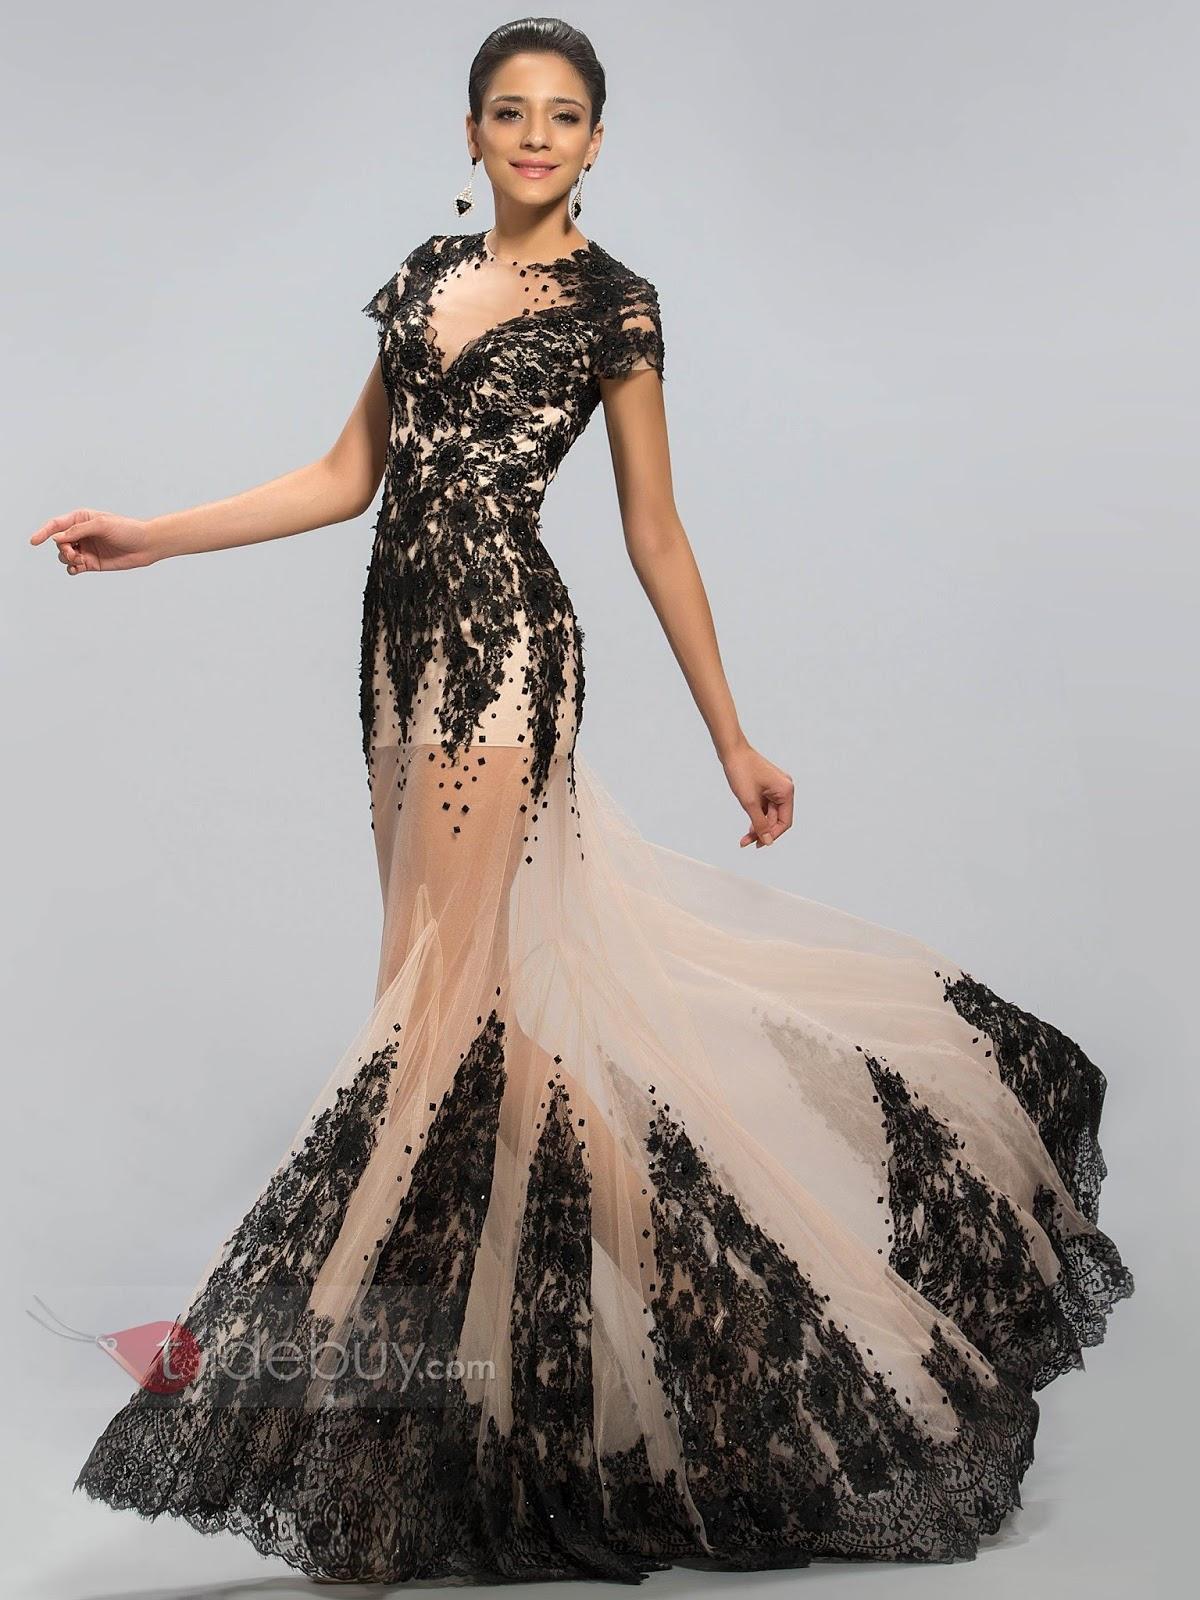 http://www.tidebuy.com/c/Designer-Dresses-103885/designer/